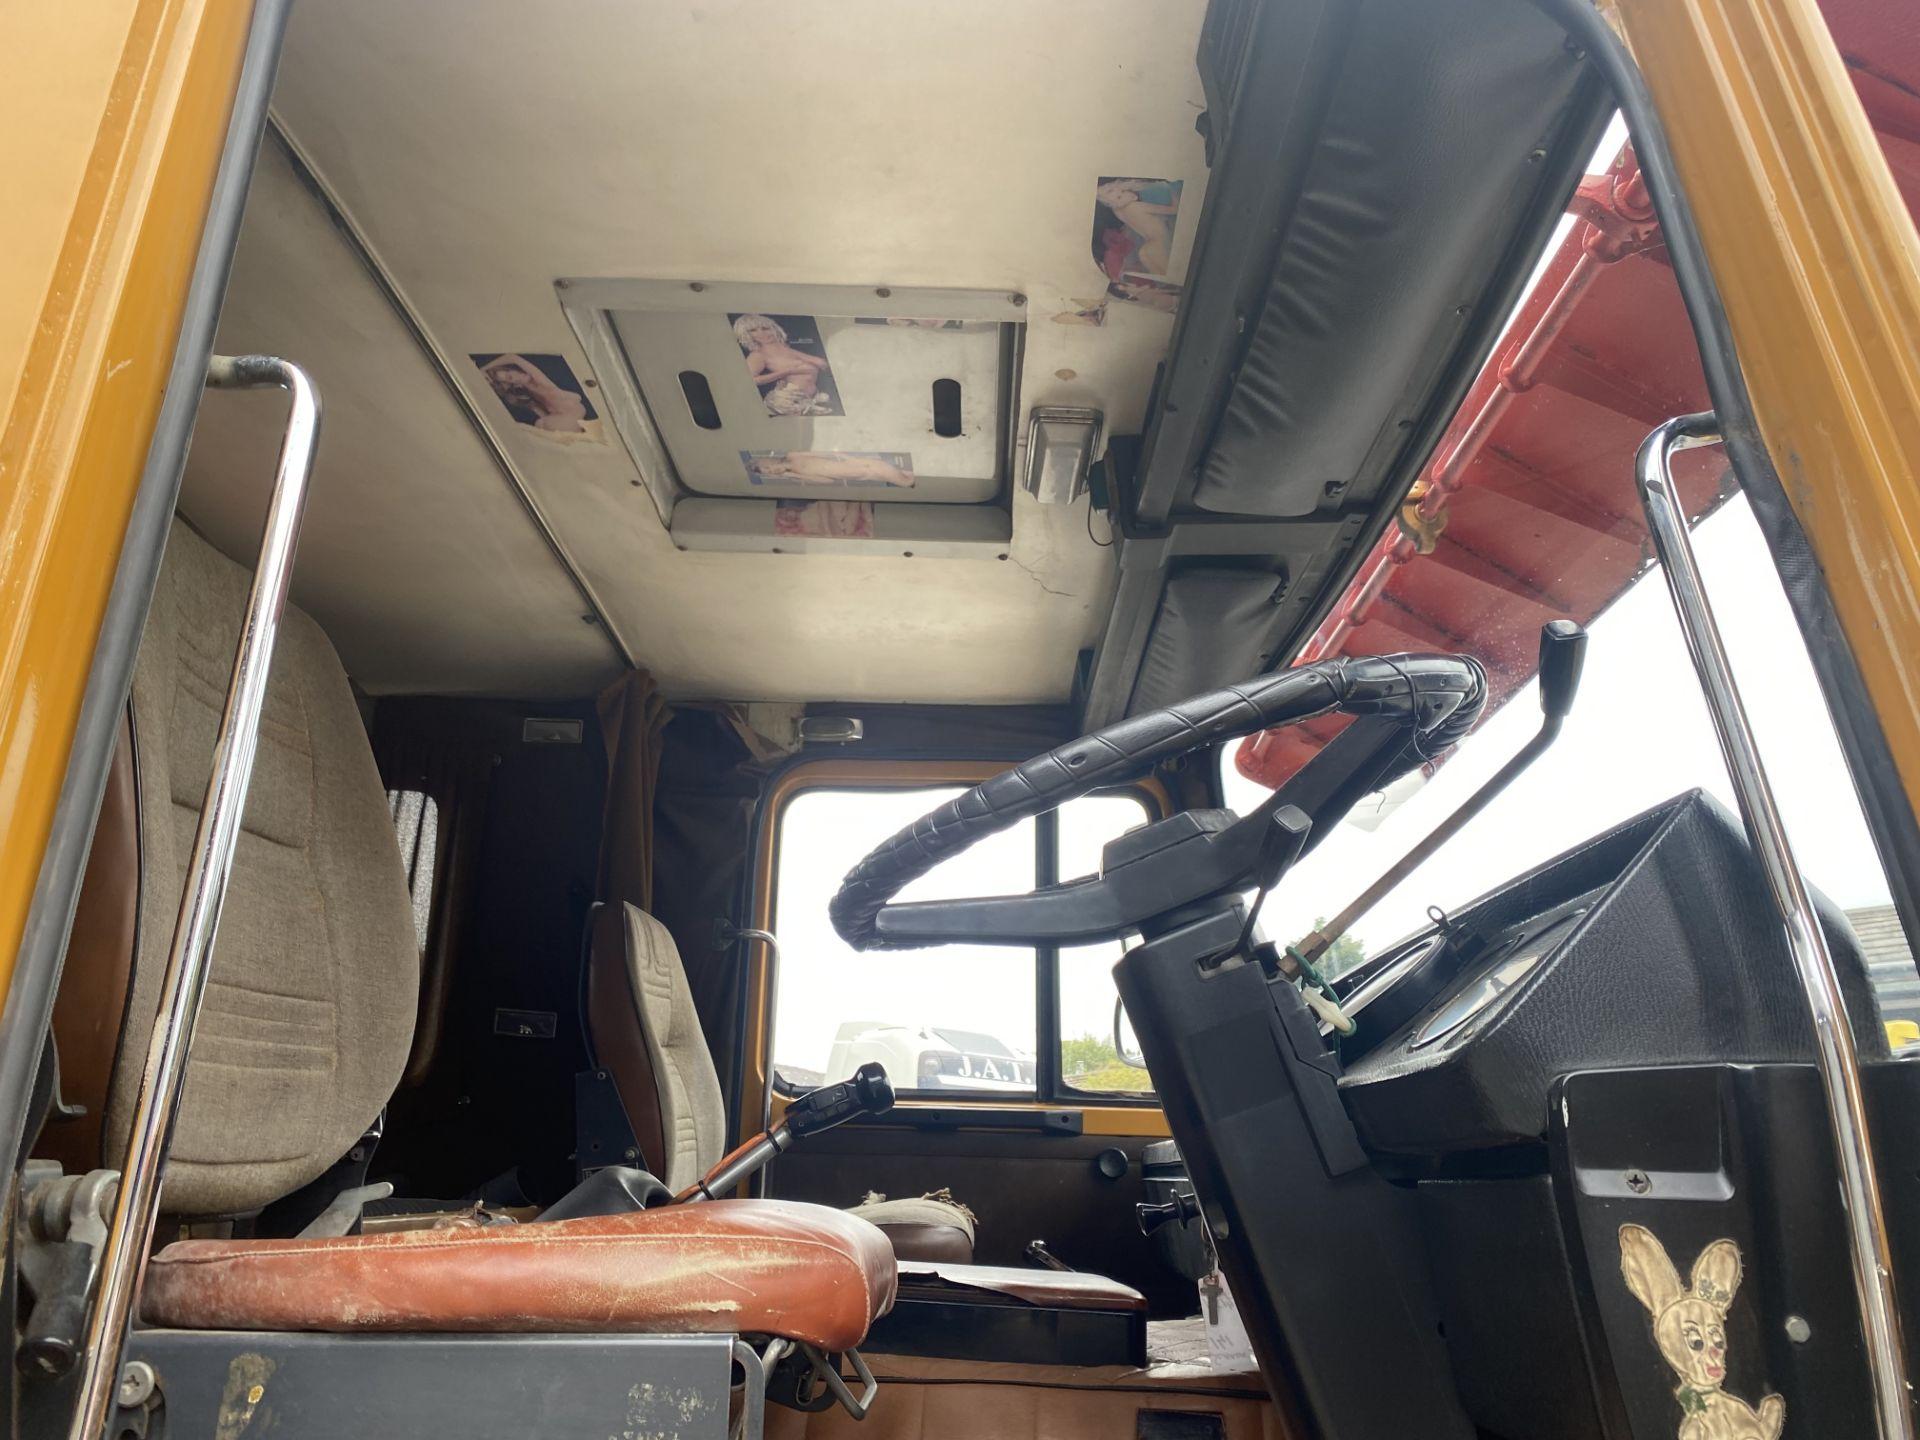 Scania 140 V8 4X2 TRACTOR UNIT, 1976, original vehicle (ex Italy - right hand drive), NOVA - Image 15 of 20